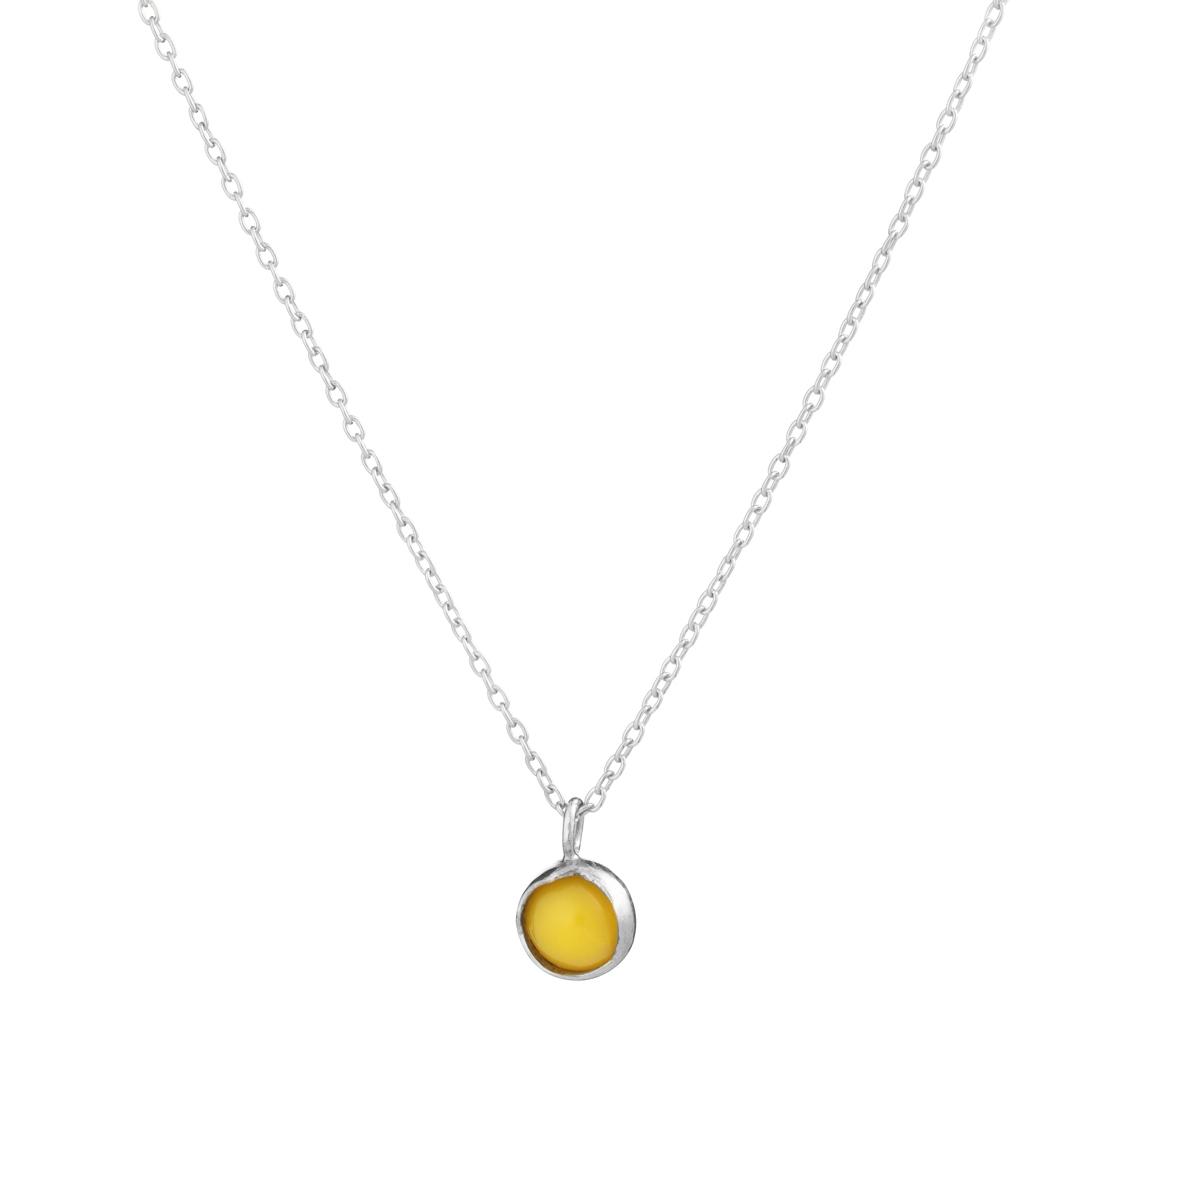 BLOSSOM bud pendant with egg yolk amber